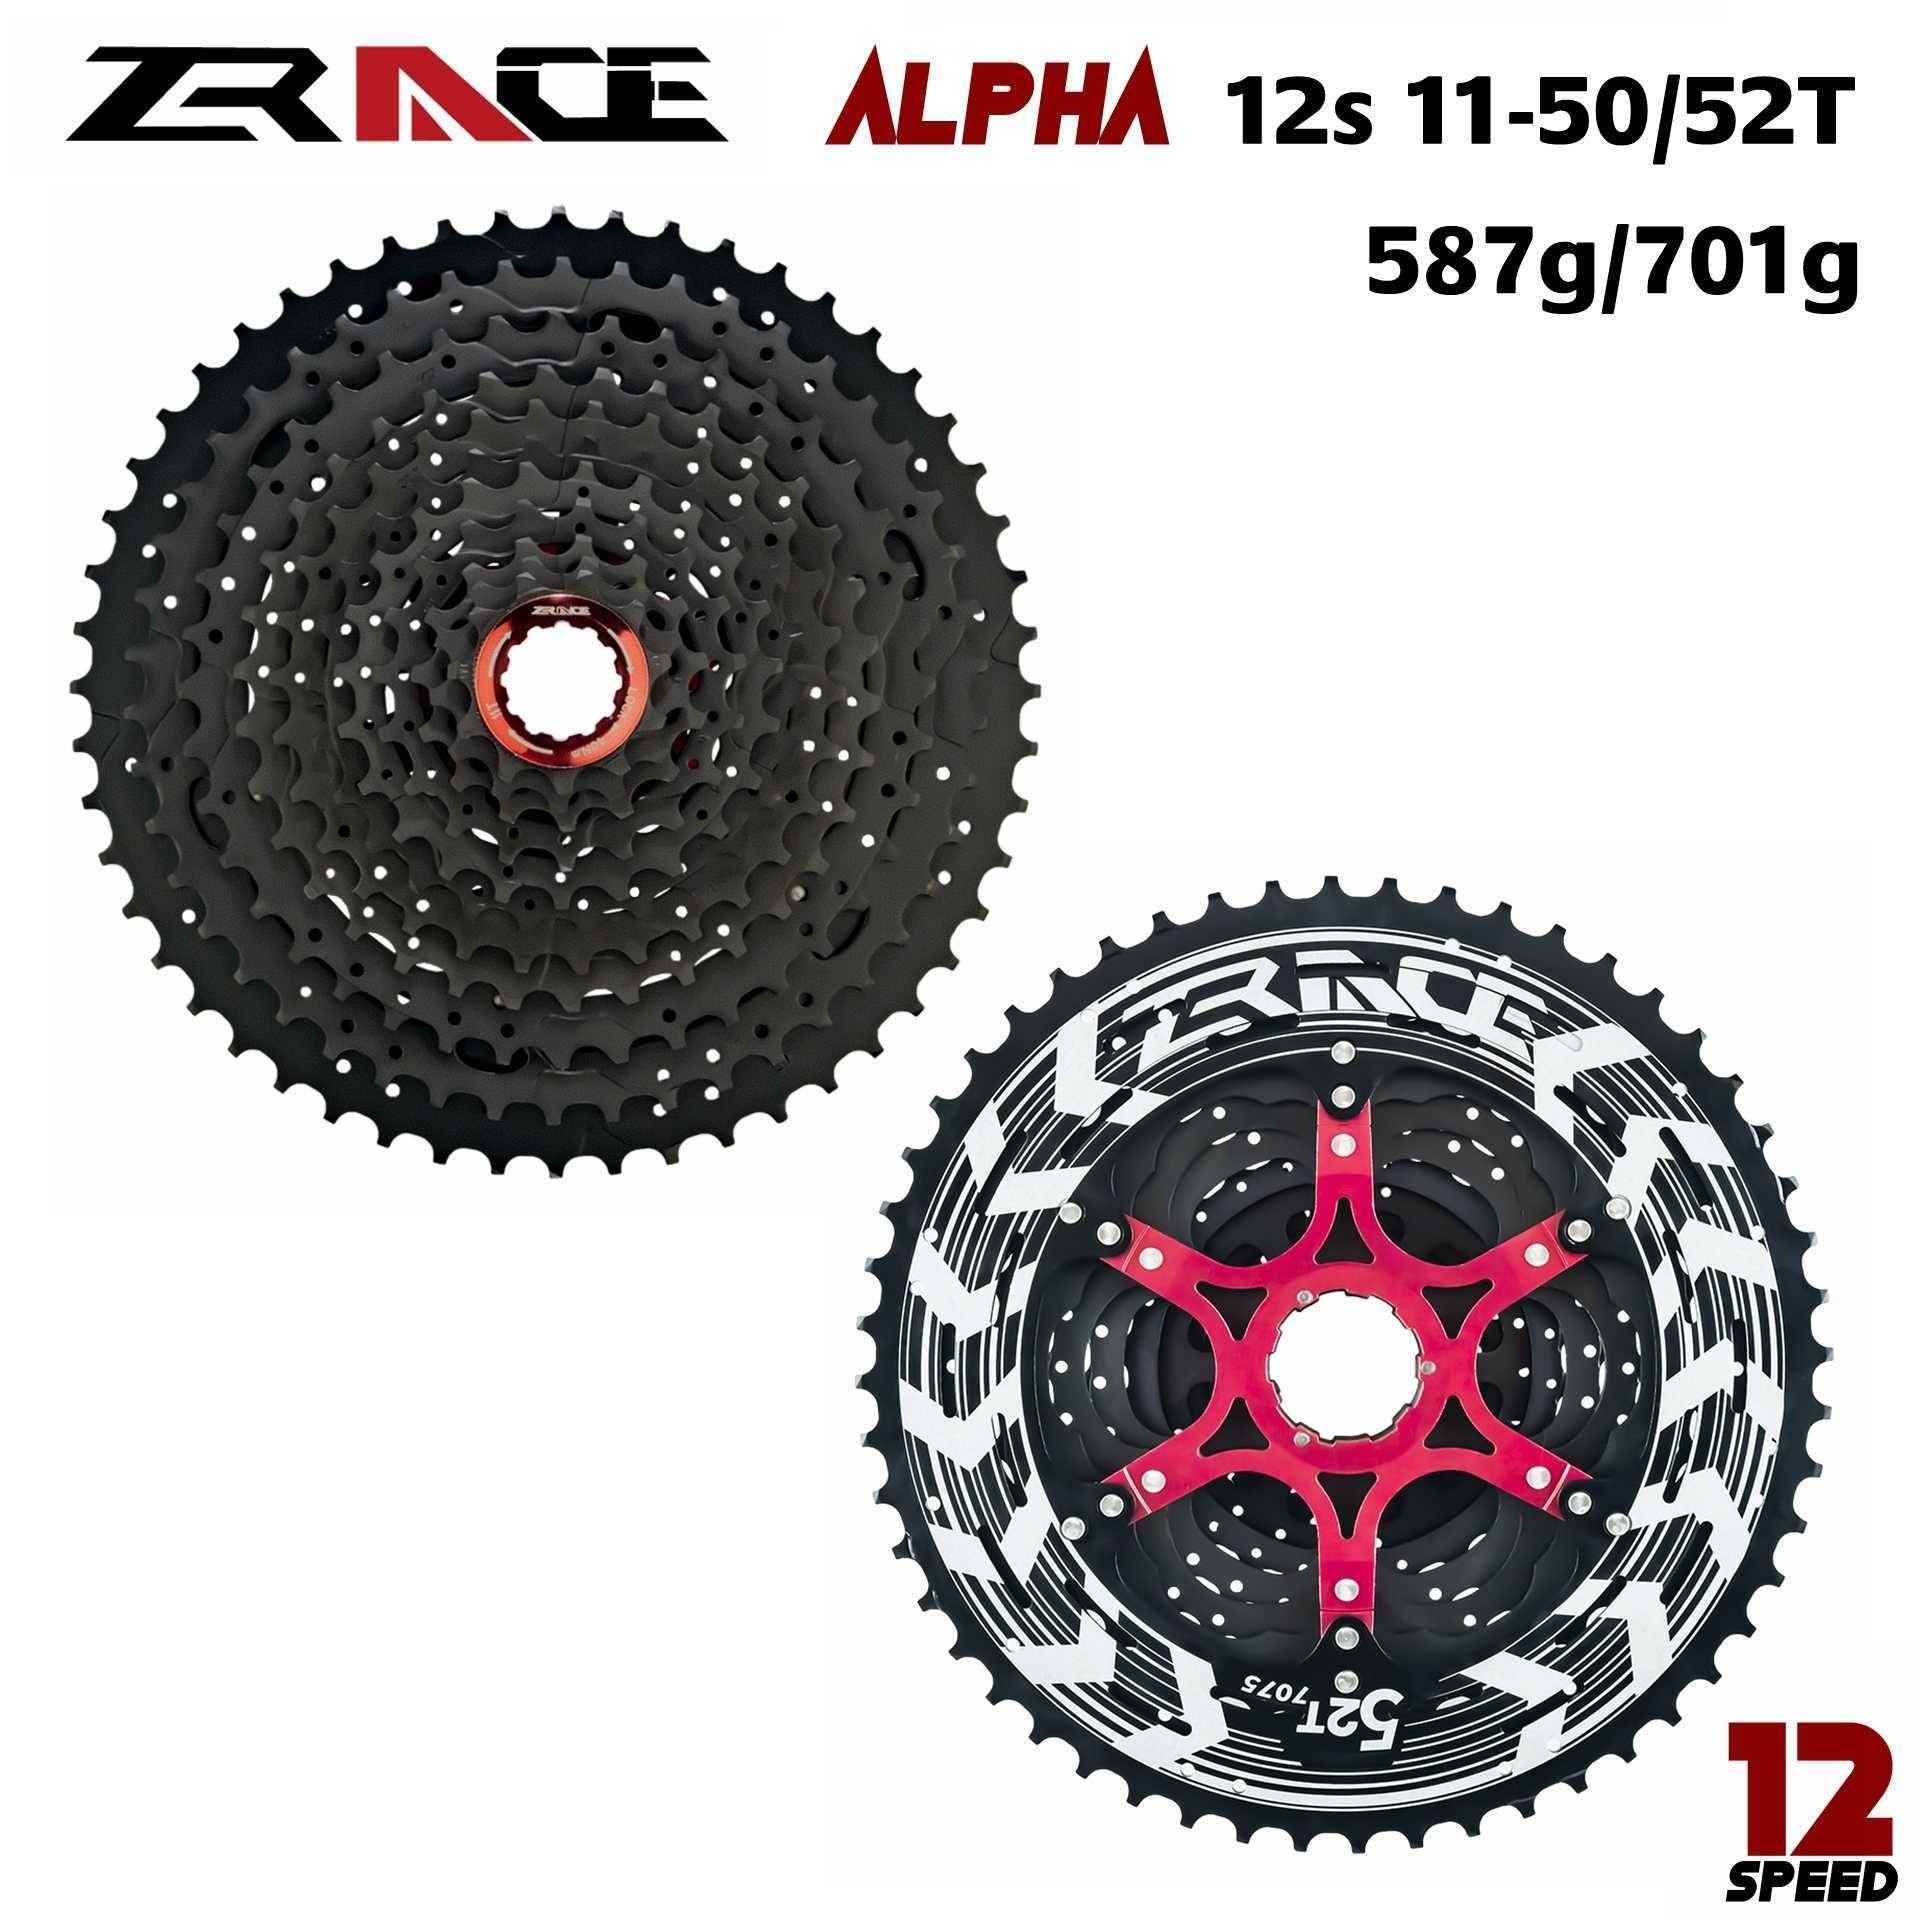 ZRACE Alpha 12s Lightweight Cassette 12 Speed MTB bike freewheel 11-50T / 11-52T - Black,compatible M9100 / XX1 X01 GX NX Eagle